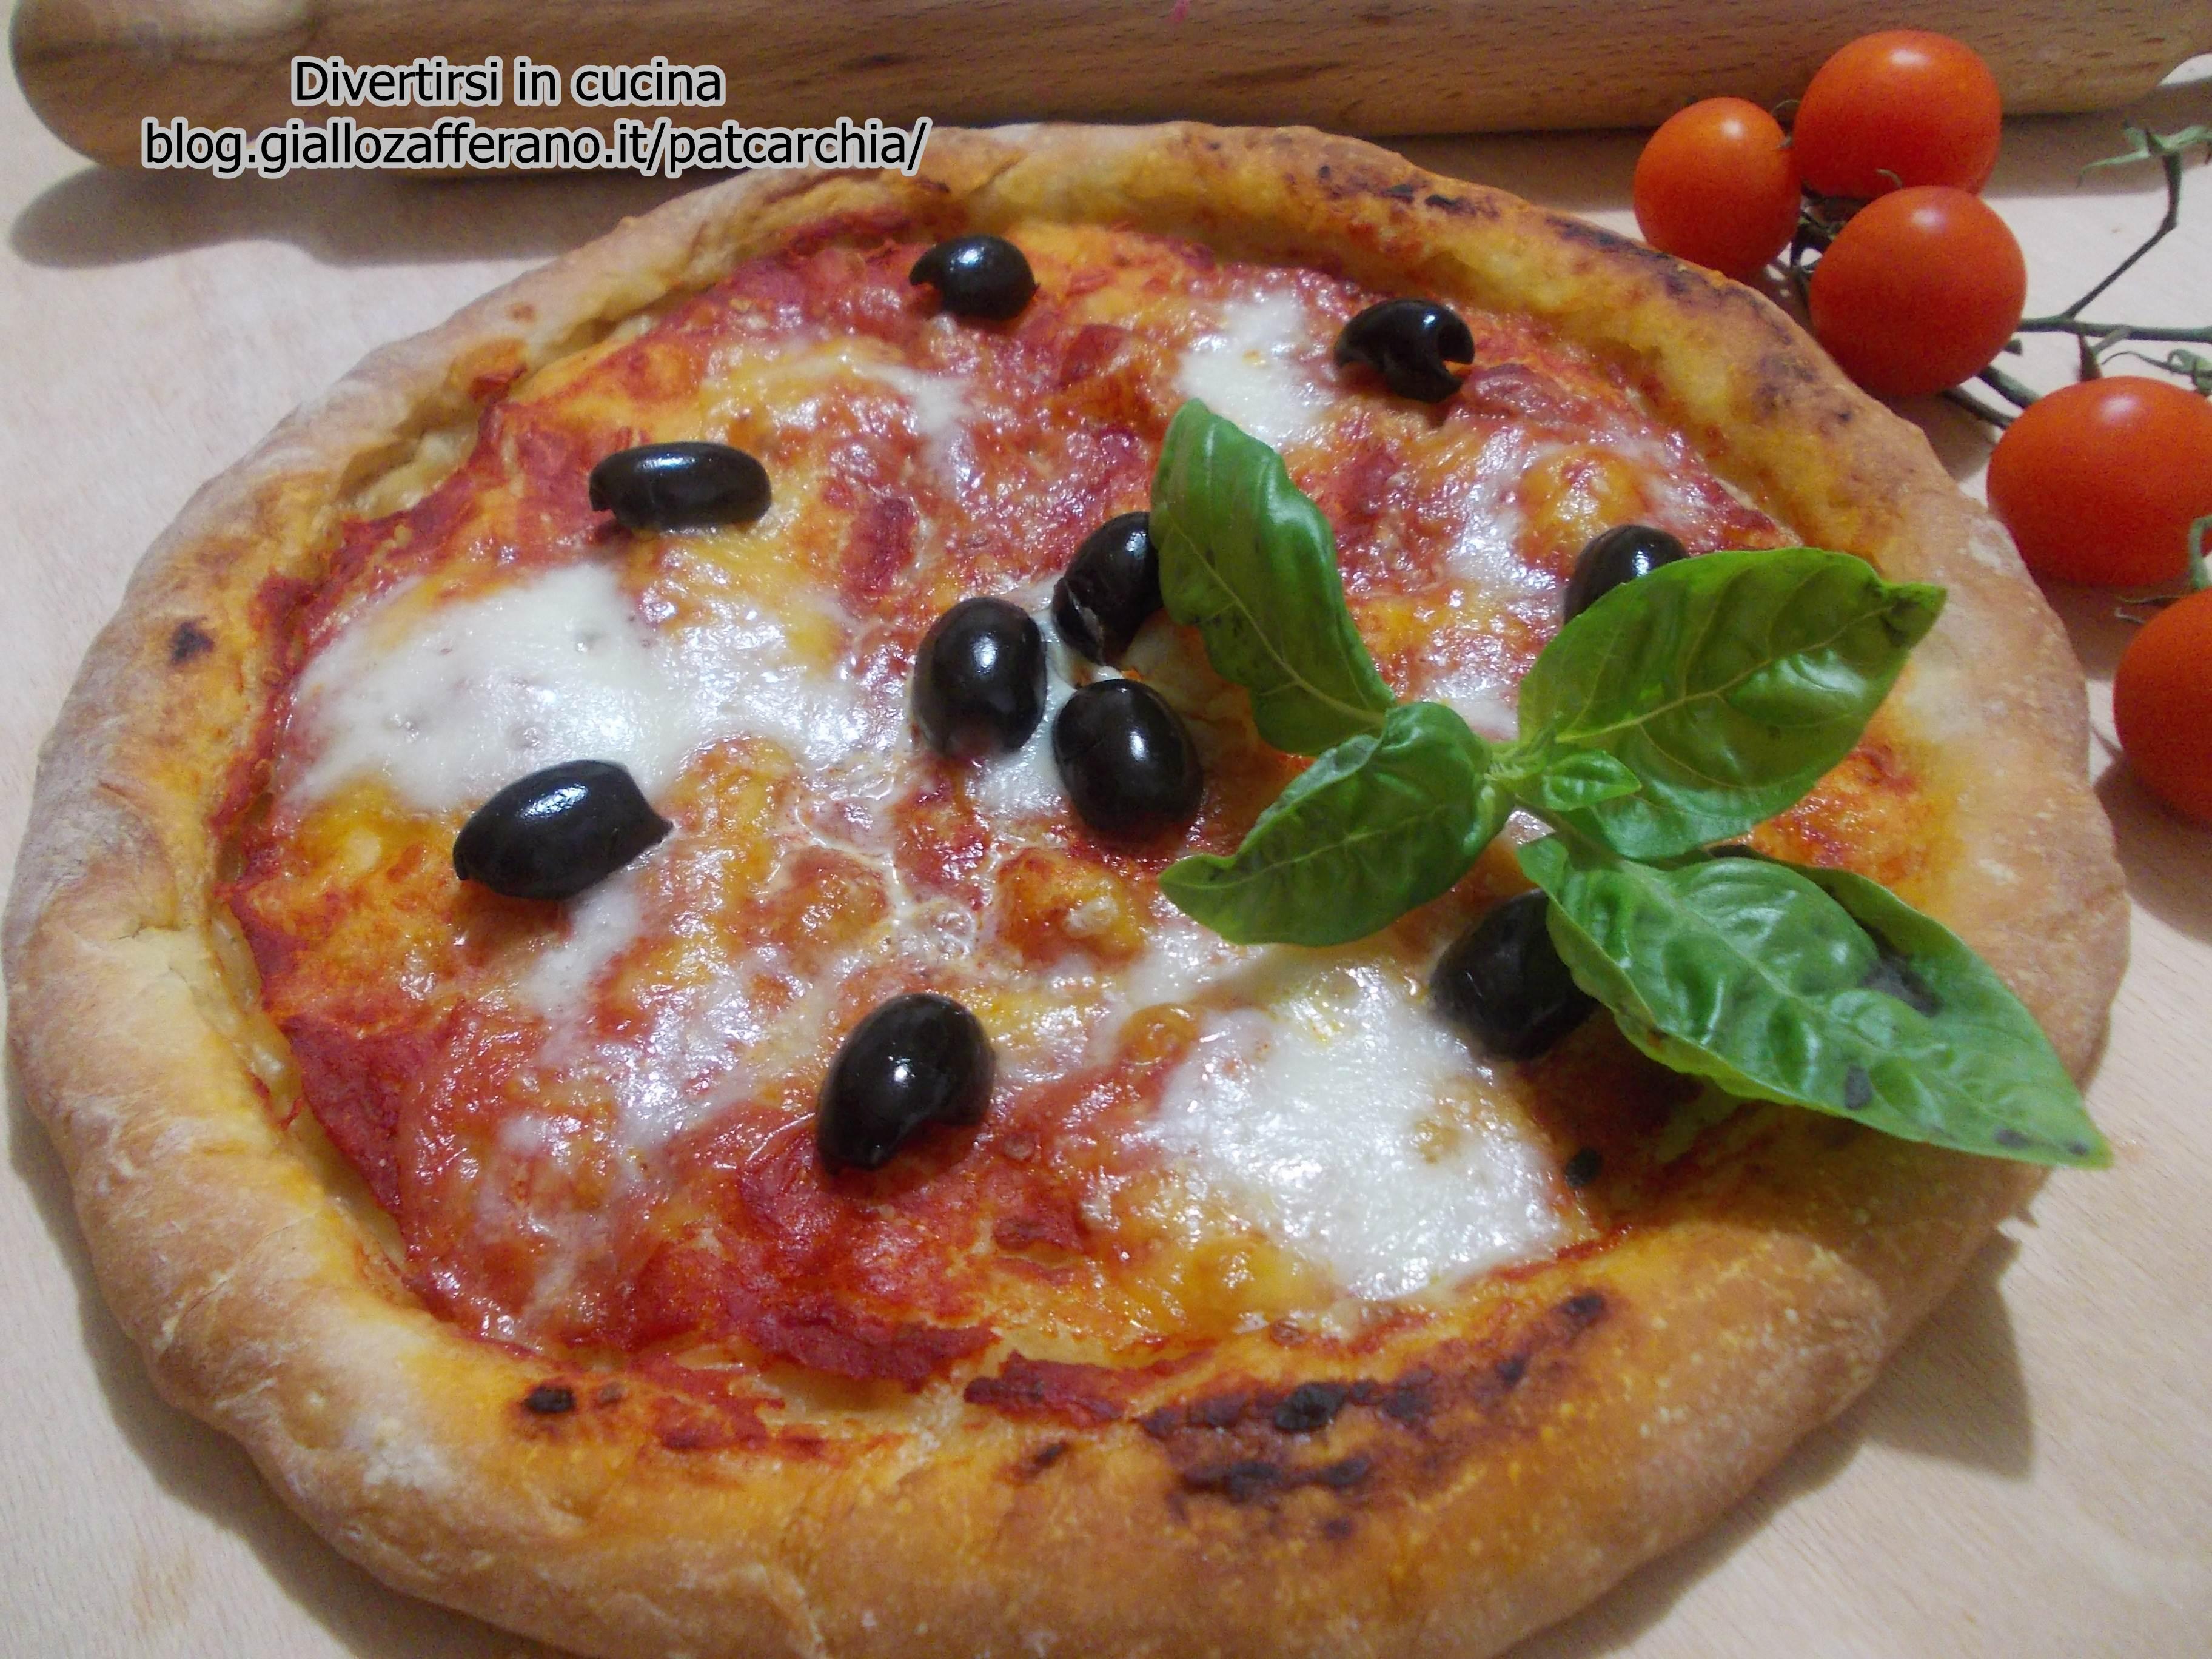 pizza napoletana ricetta base blog divertirsi in cucina blog patcarchia